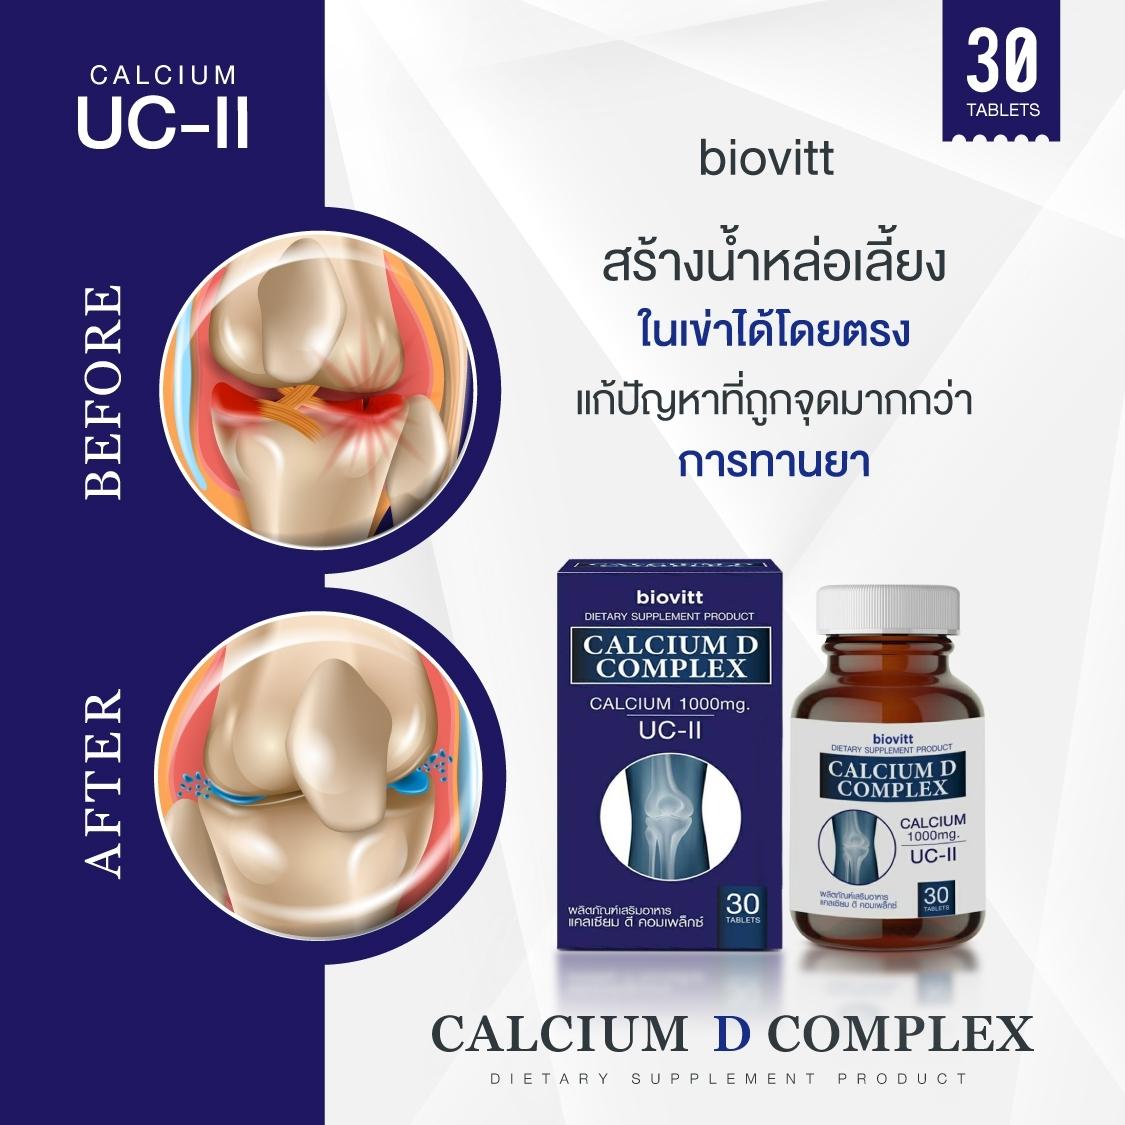 biovitt Calcium D Complex - อาหารเสริมแคลเซียม คอมเพล็กซ์ + คอลลาเจน ไทพ์ ทู (30 เม็ด)